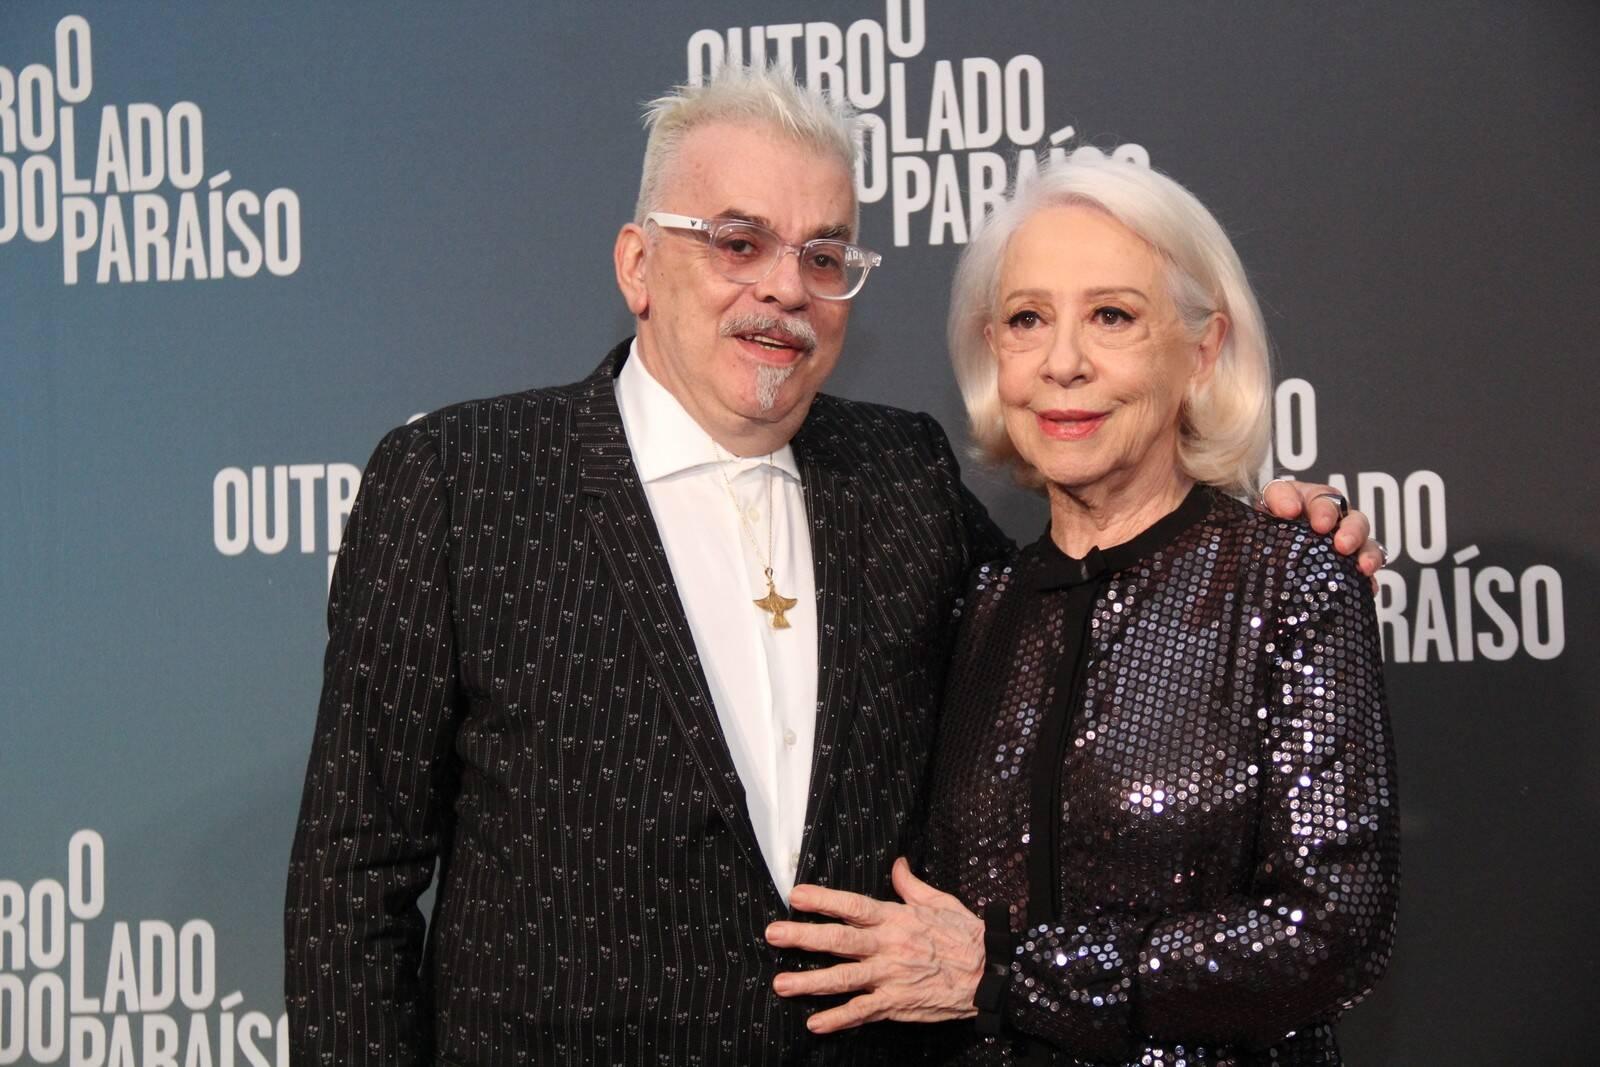 Walcyr Carrasco e Fernanda Montenegro